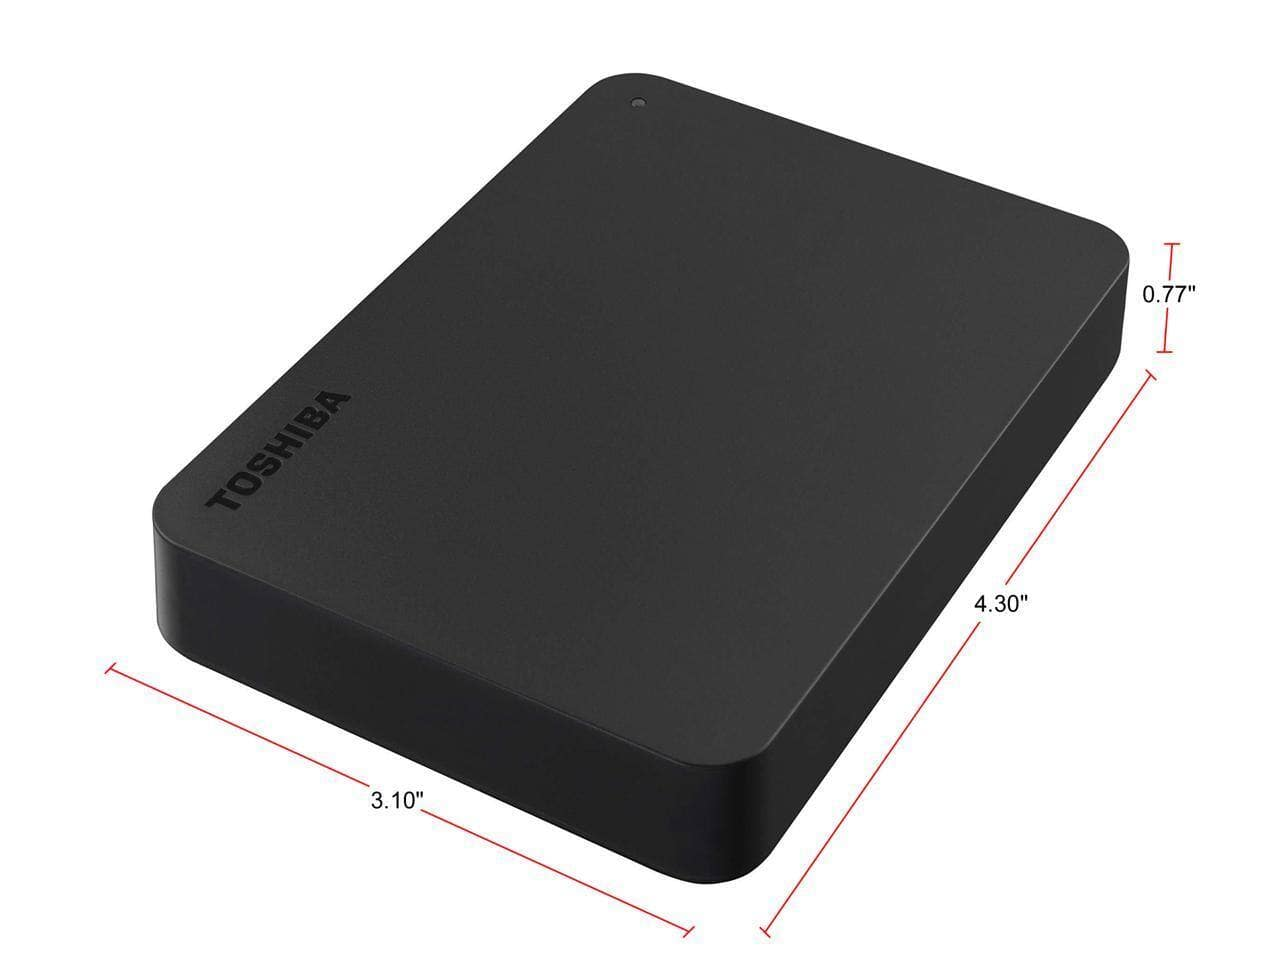 Toshiba Canvio Basics Portable External USB 3.0 Hard Drive | 1TB for $39.99, 2TB for $51.99, 4TB for $79.99 + Free Shipping